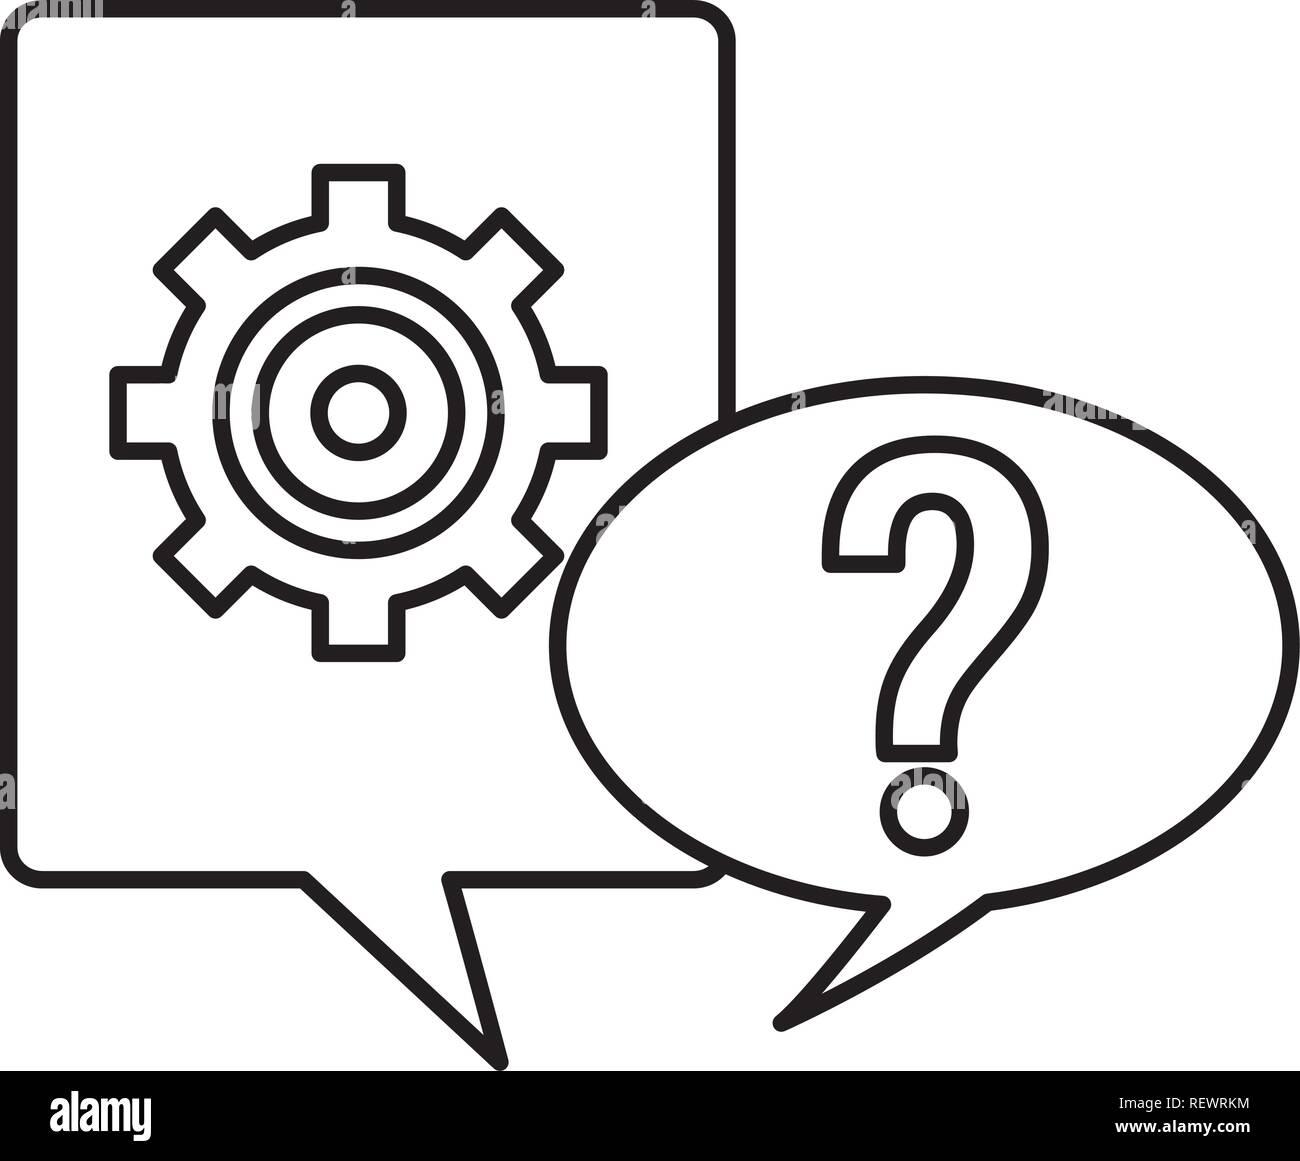 speech bubble icon - Stock Image